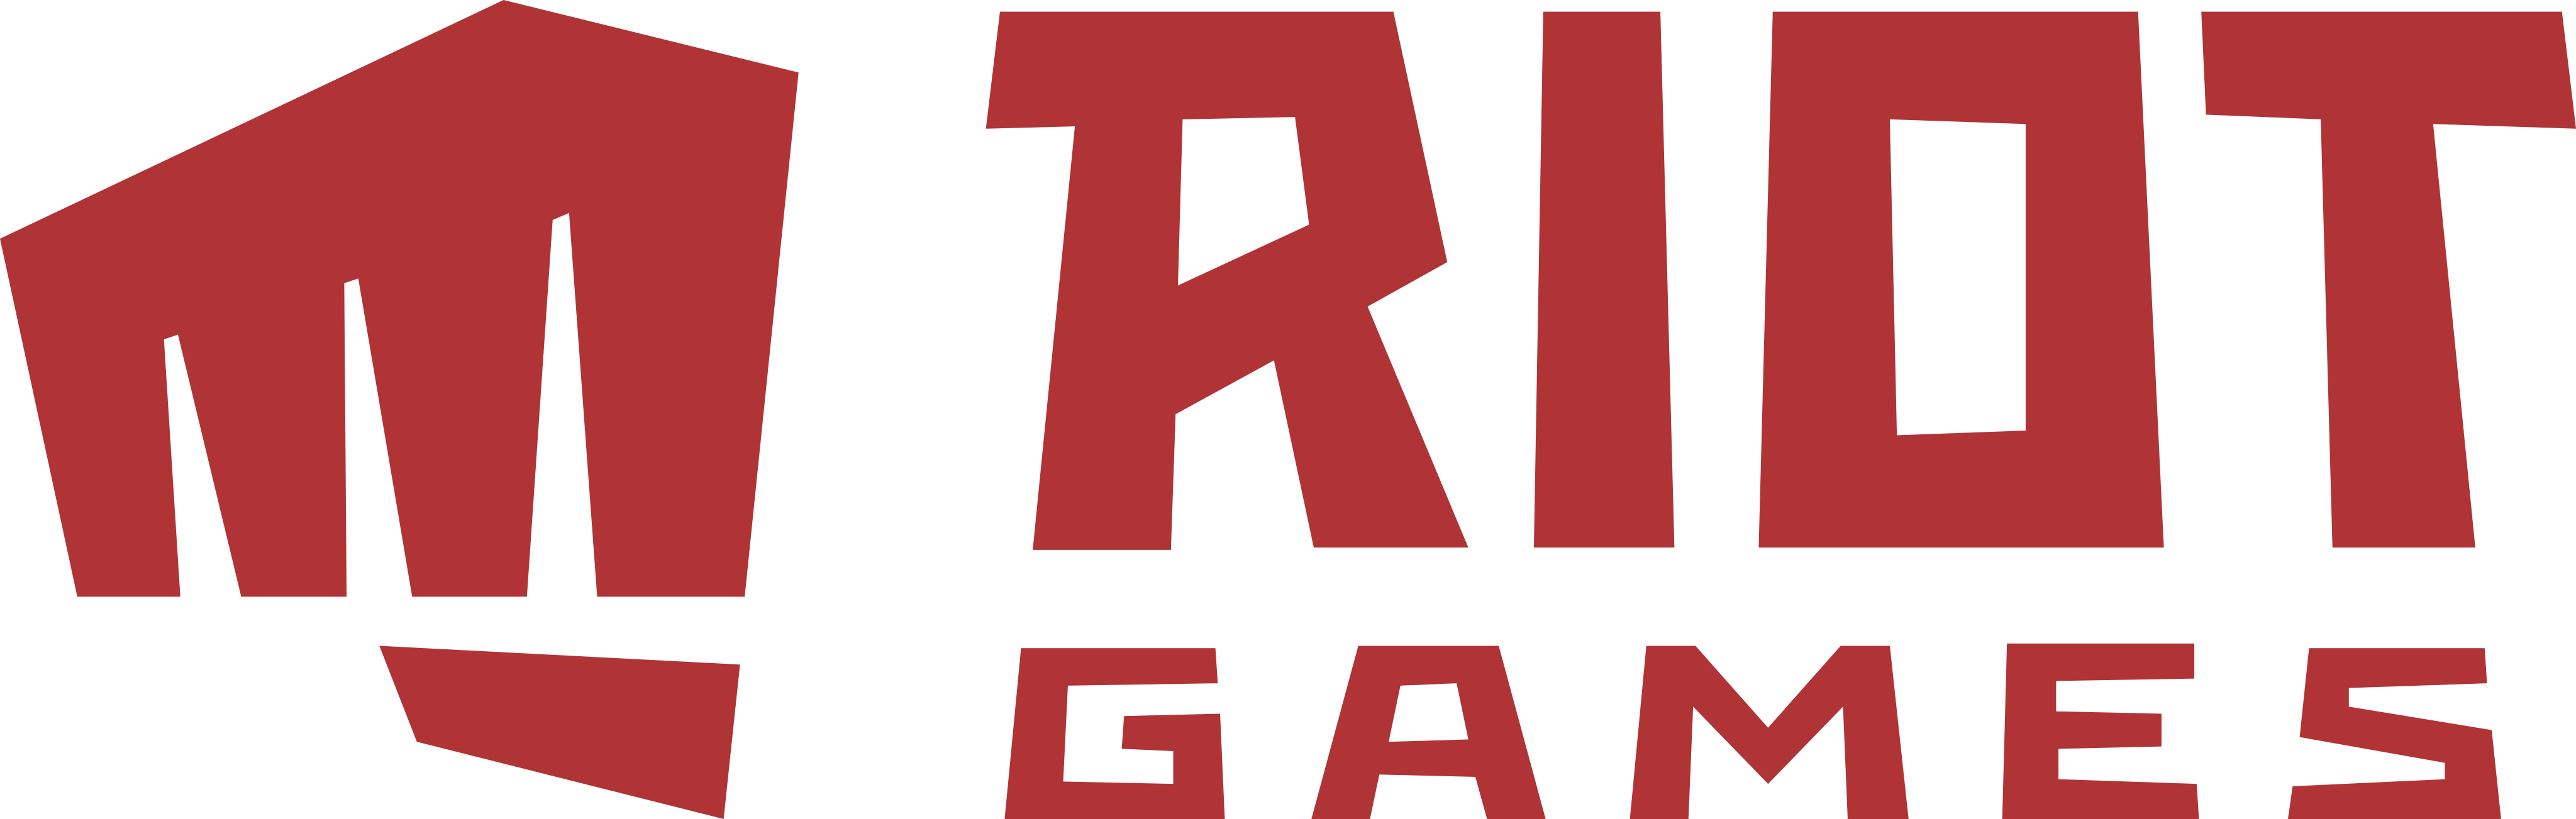 Riot Games Logo.